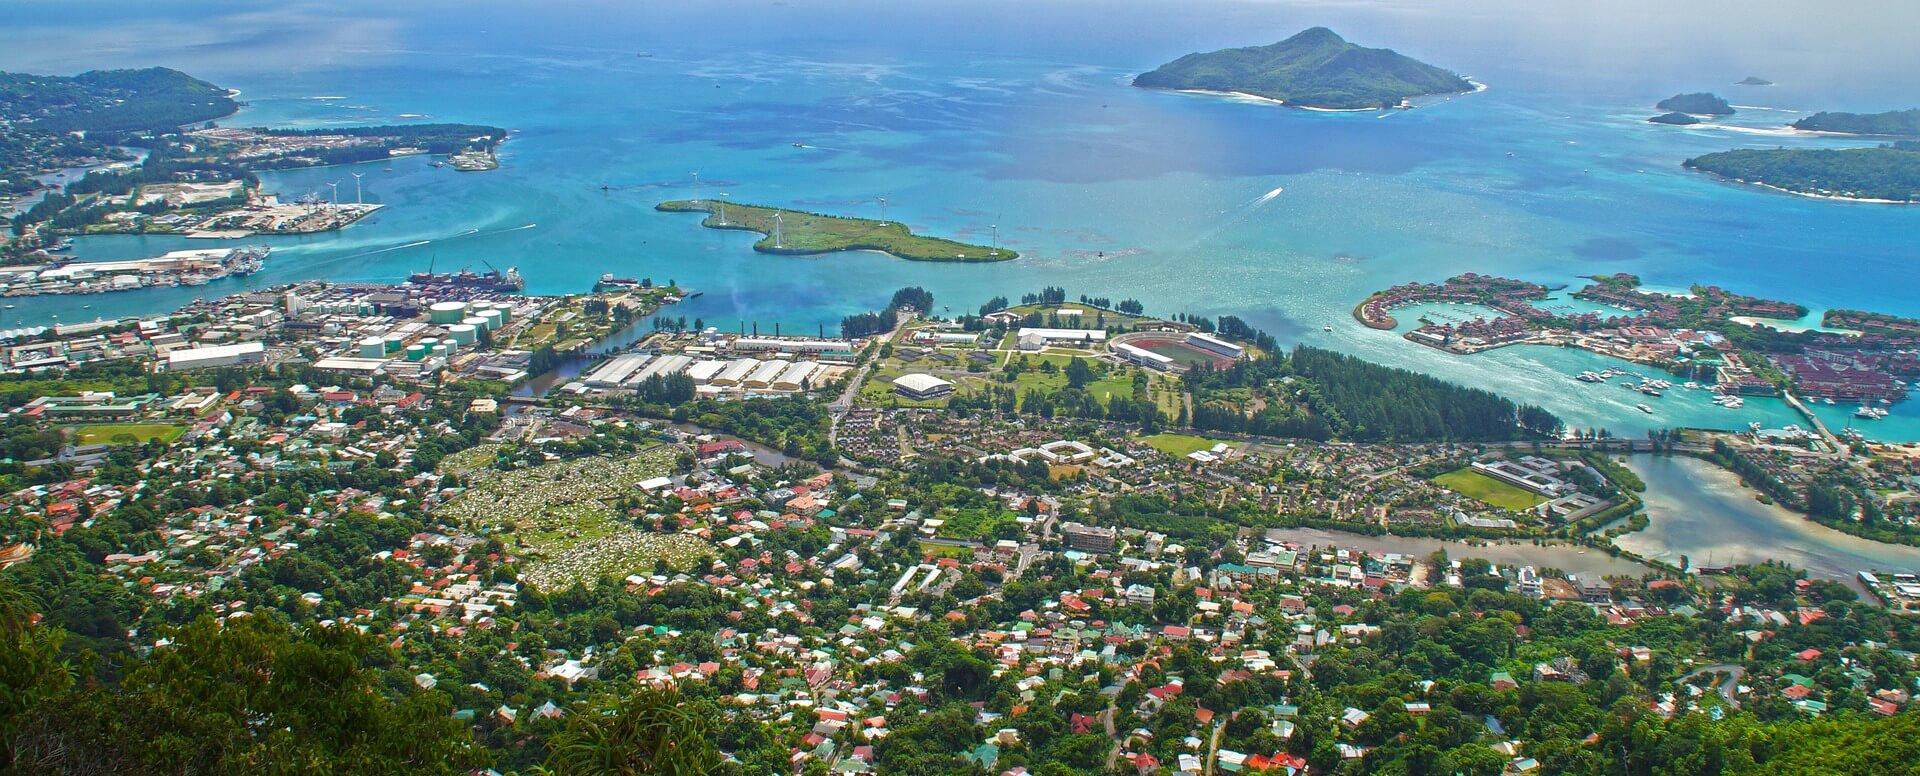 2. Visiter la capitale Victoria - Seychelles